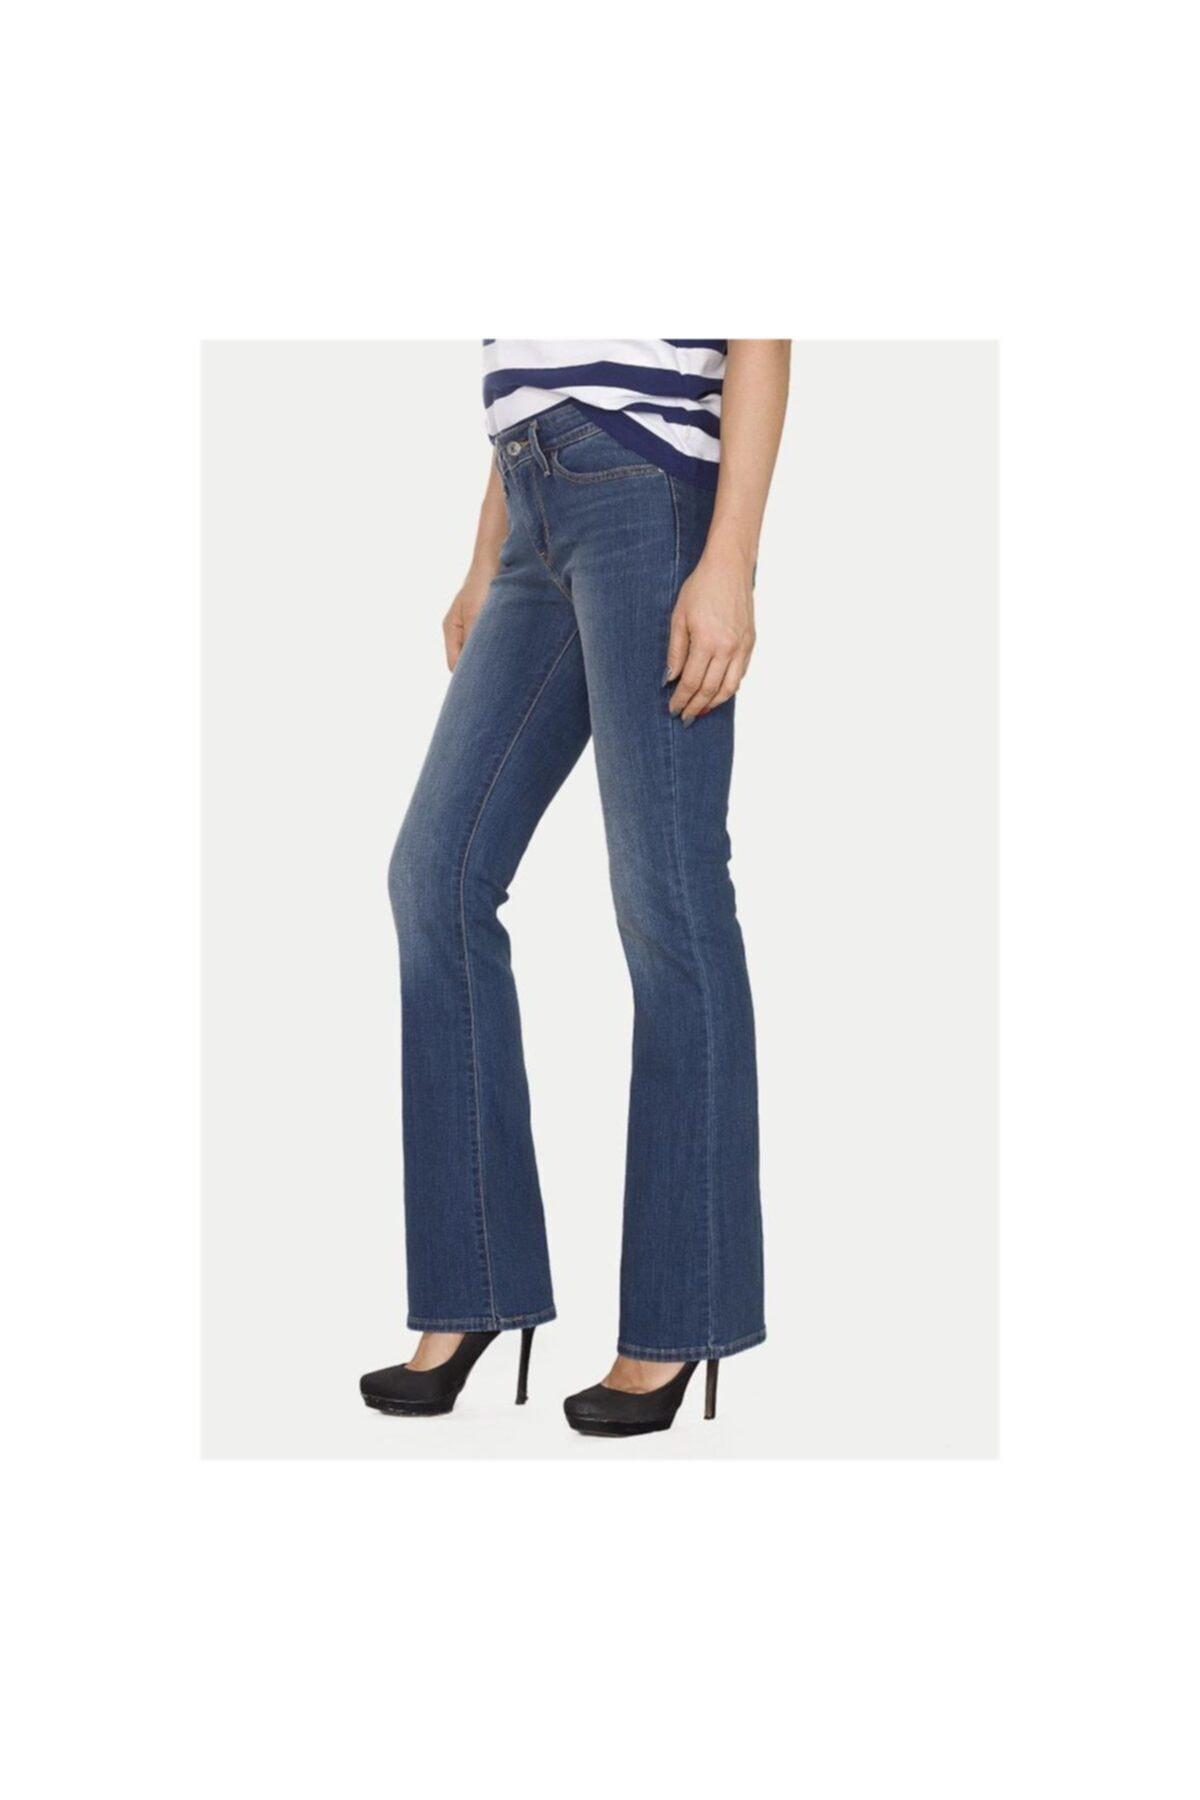 Levi's Jeans 715 Bootcut 2